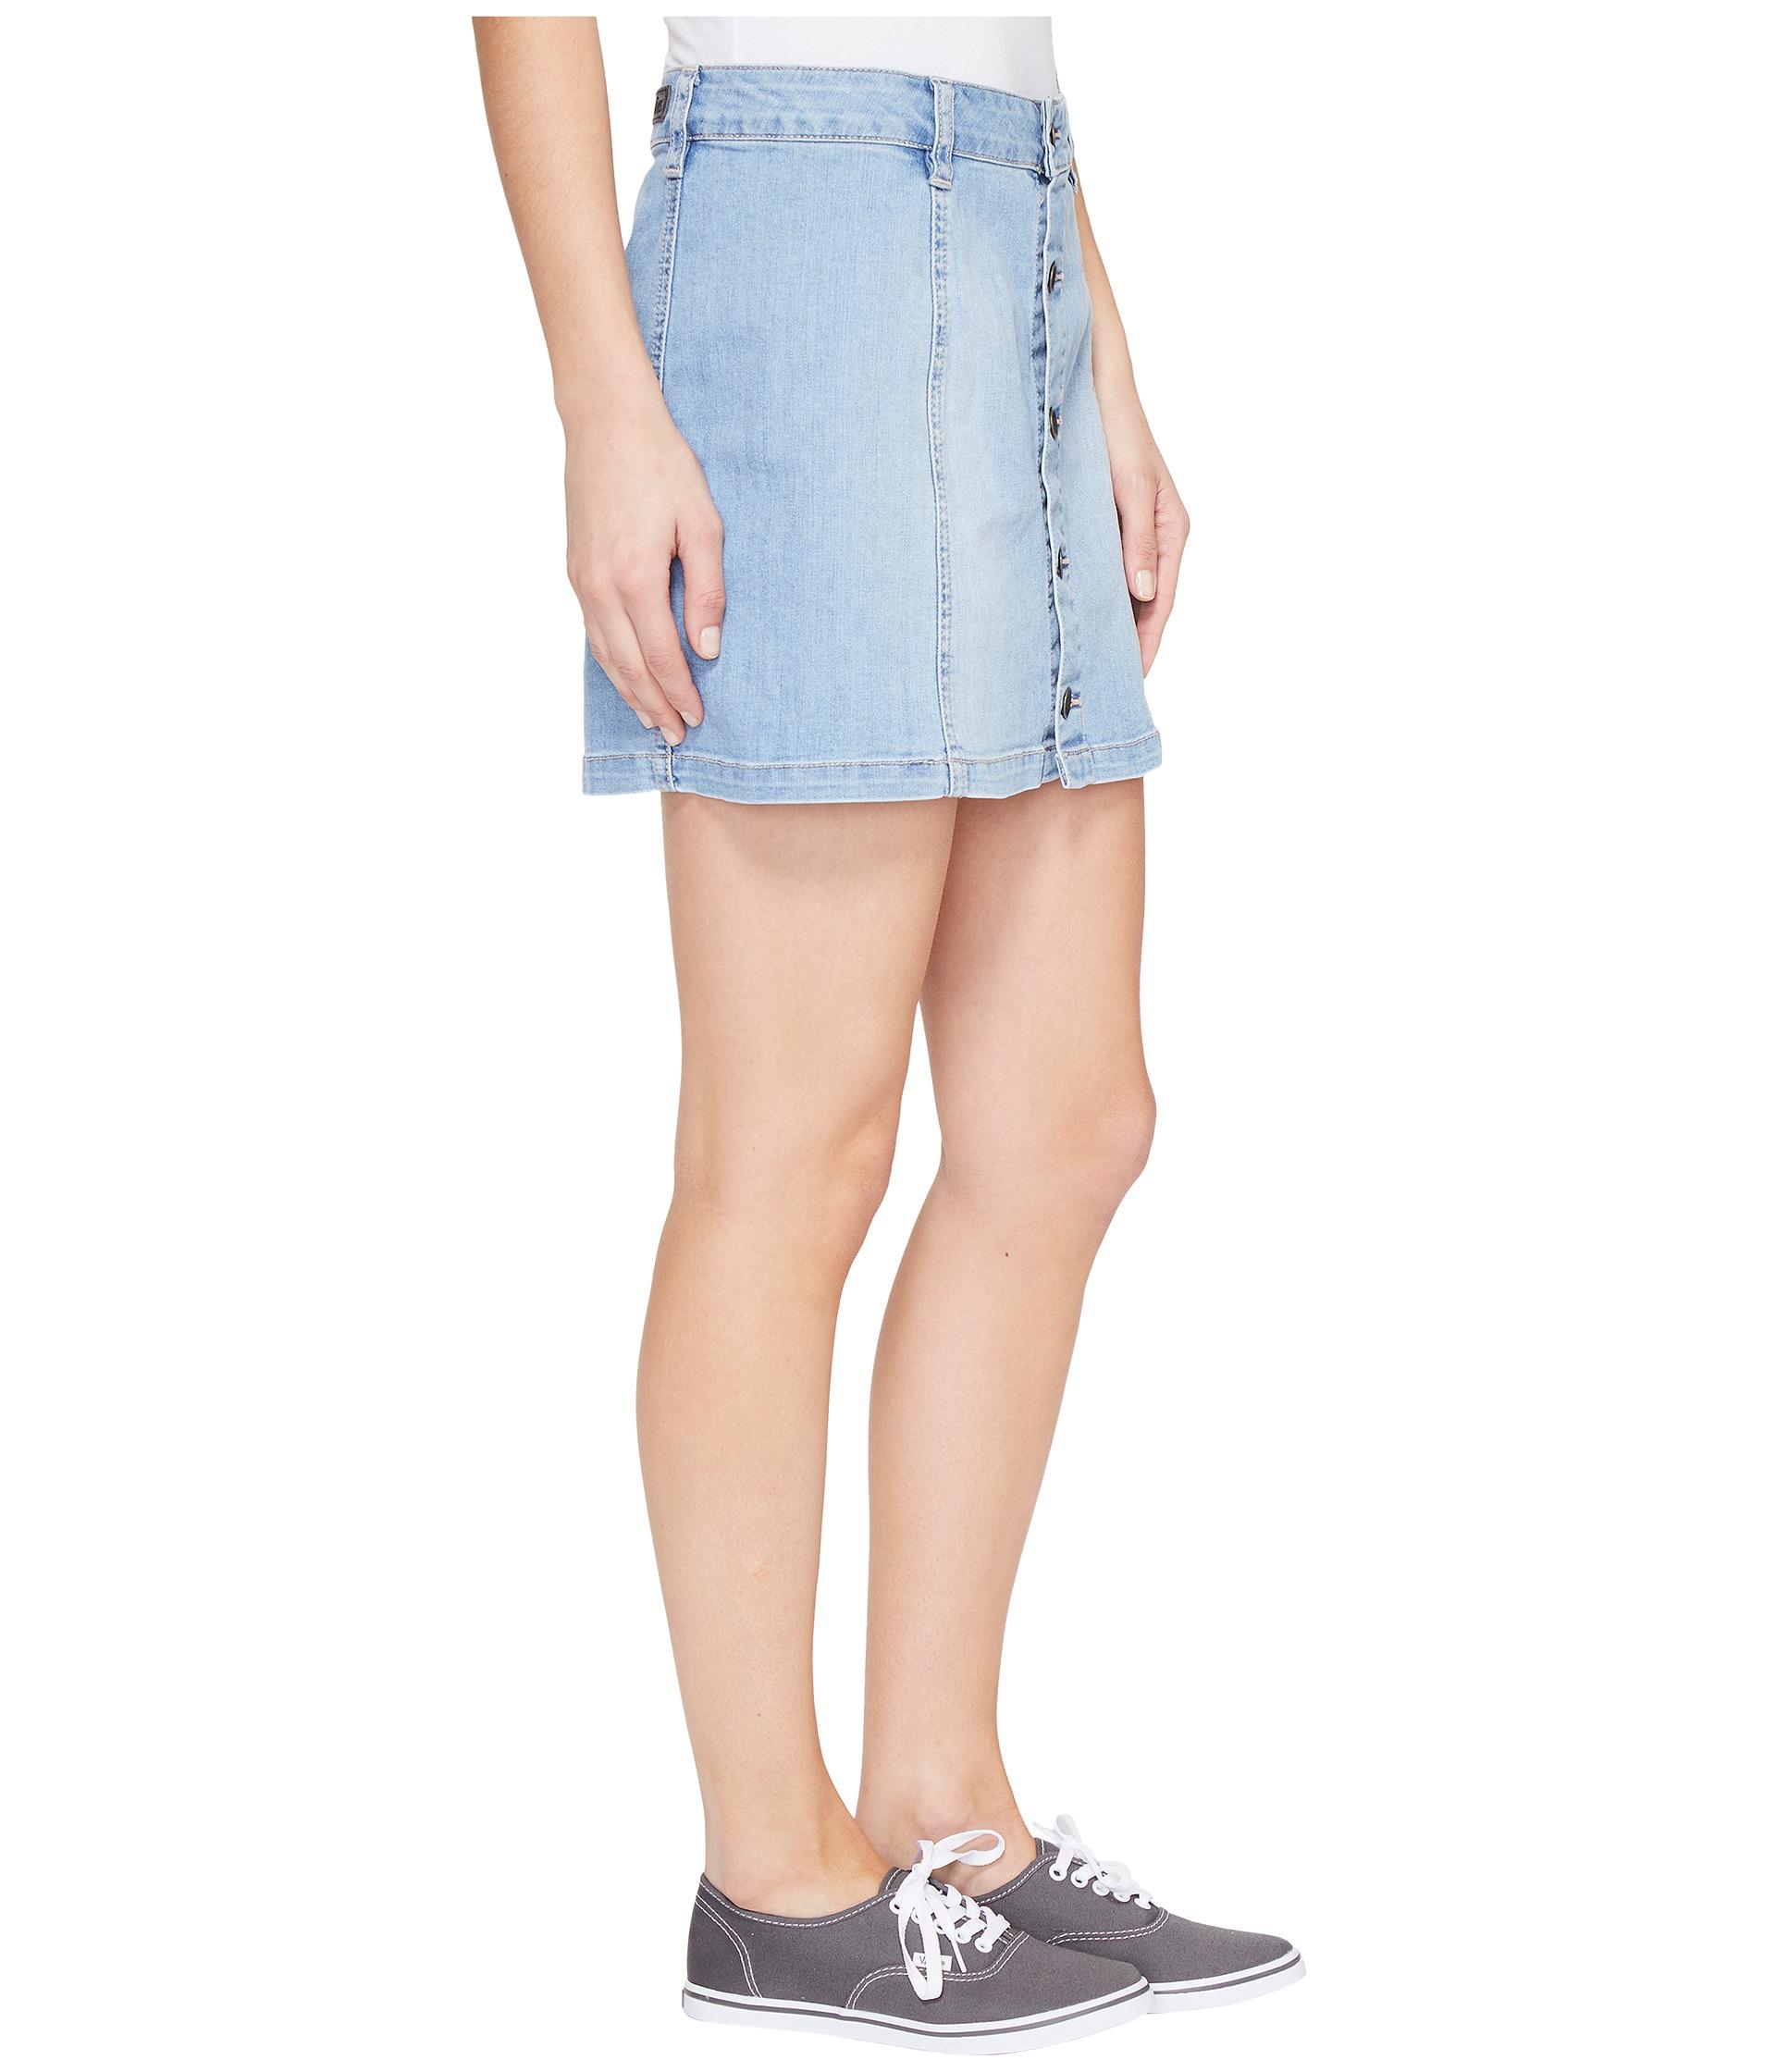 Vans A-Line Skirt - Zappos.com Free Shipping BOTH Ways